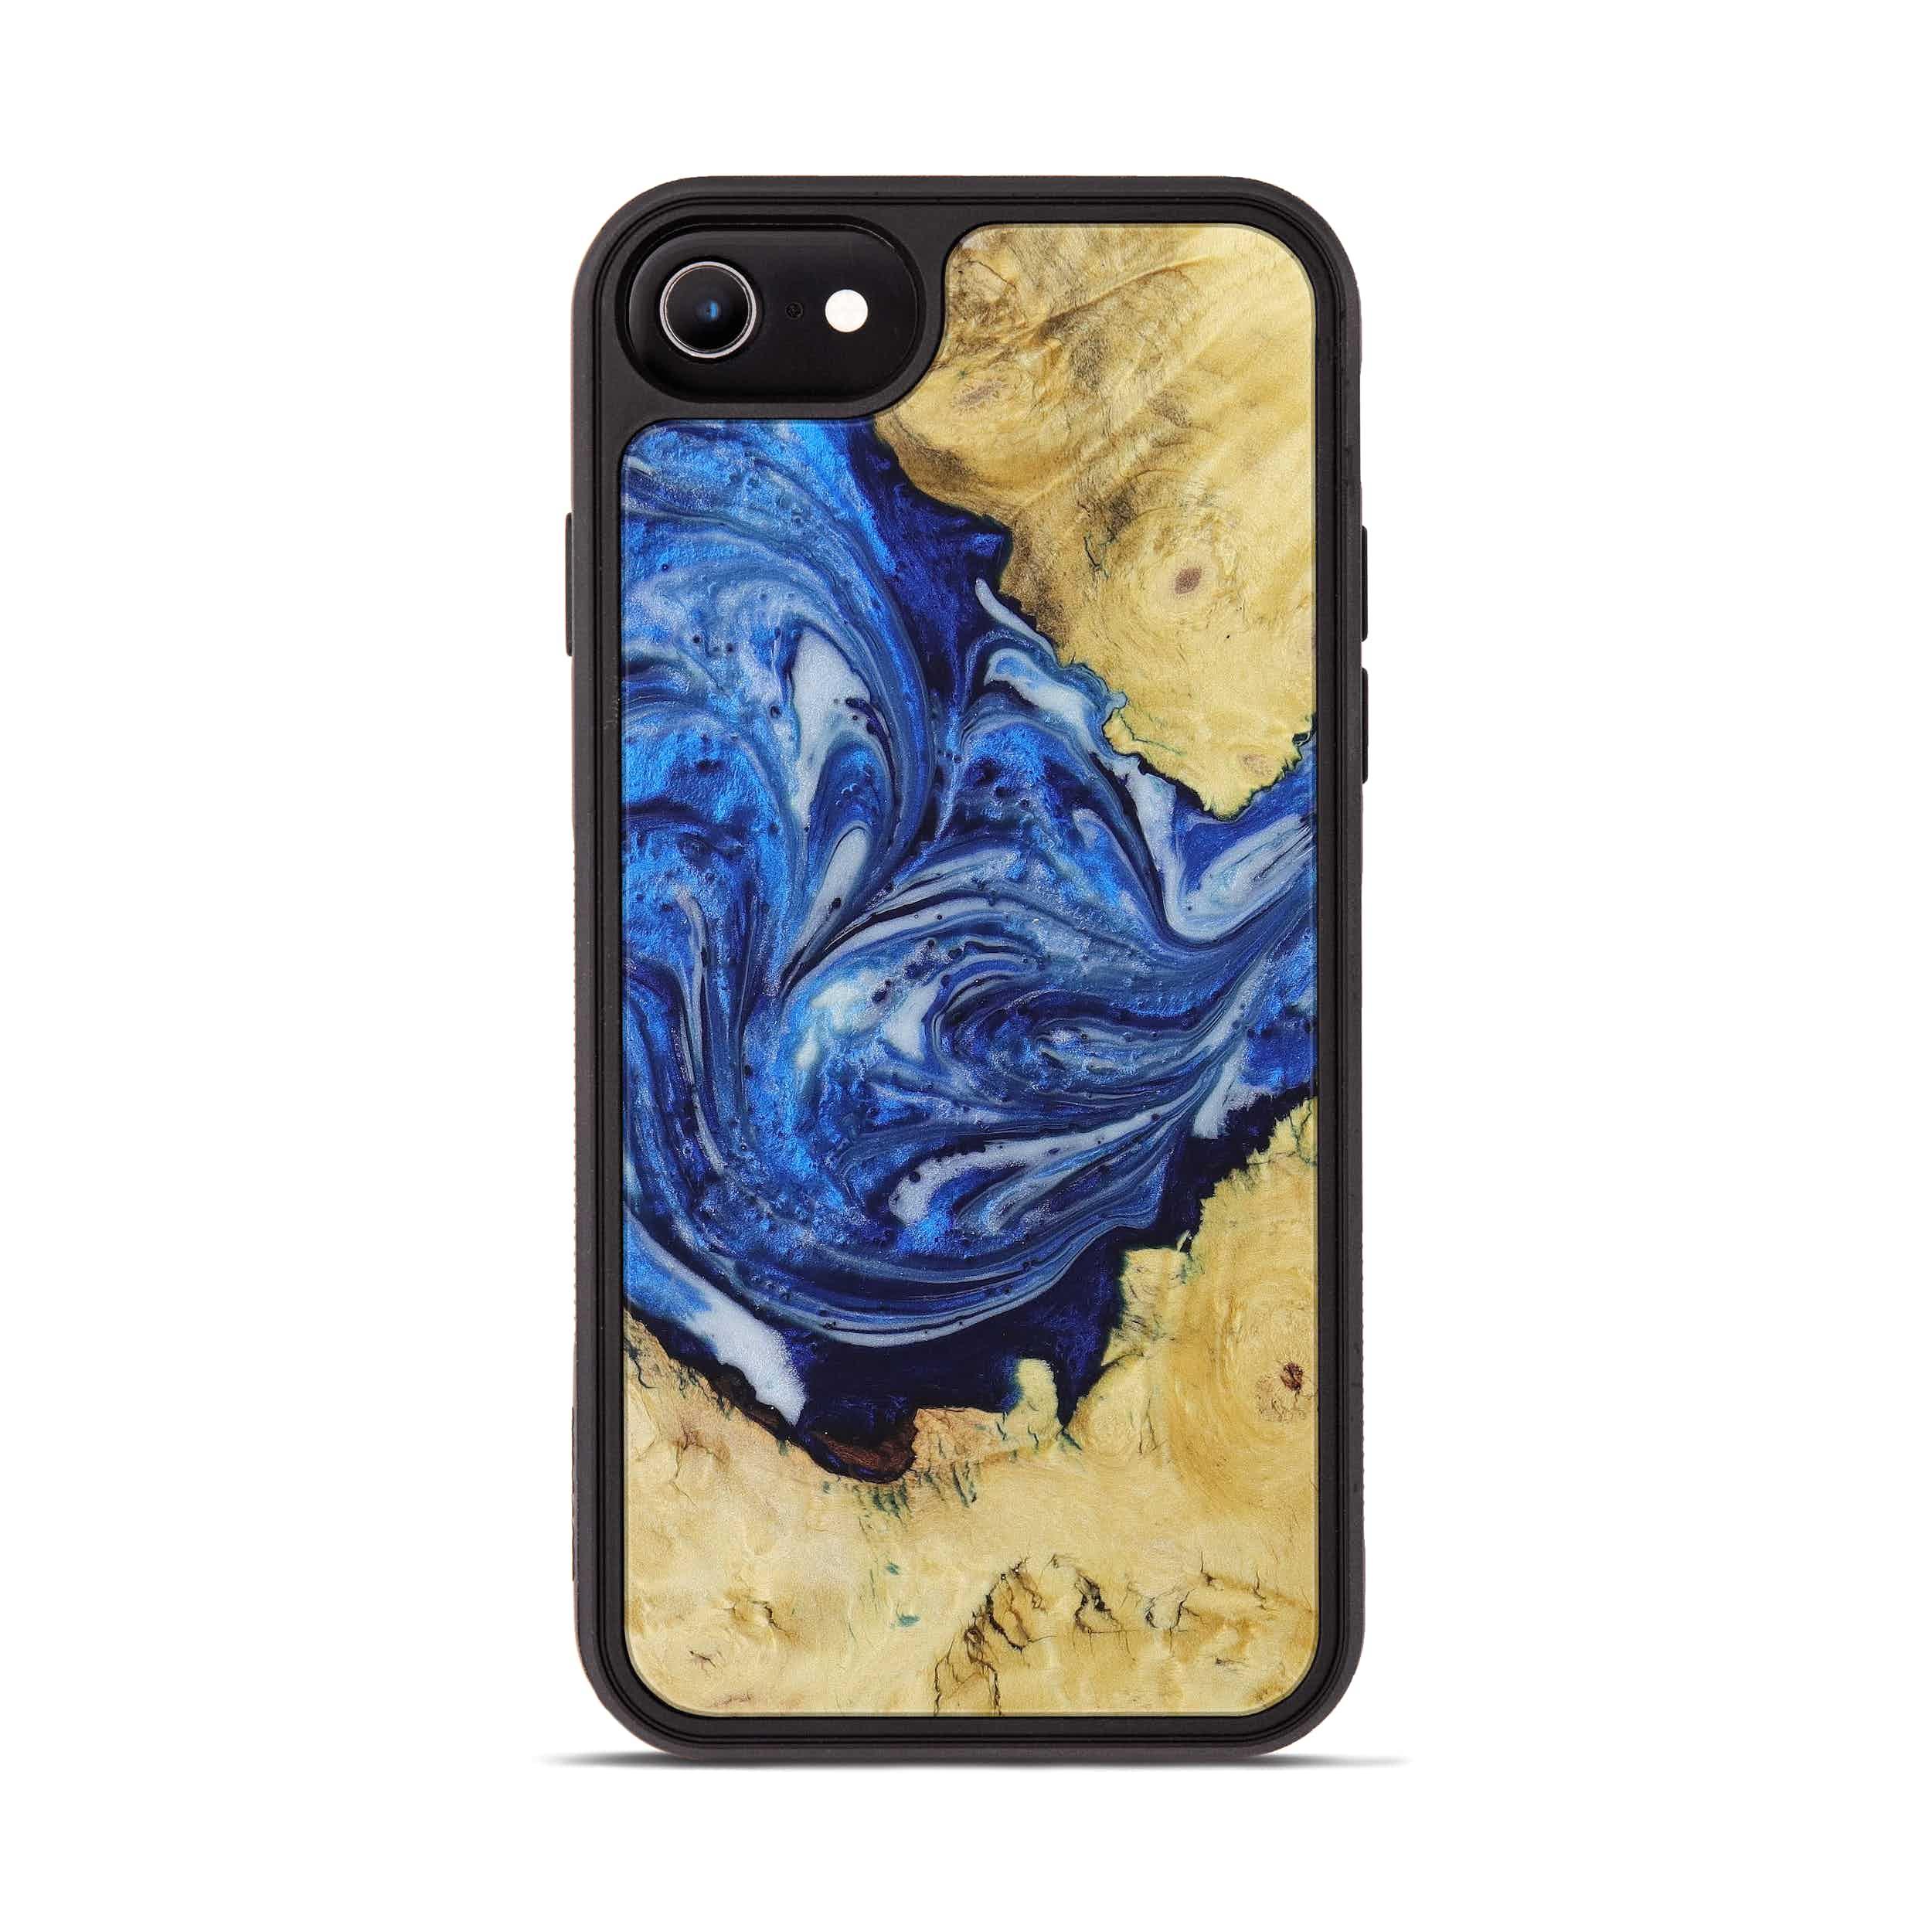 iPhone 6s Wood+Resin Phone Case - Bennet (Dark Blue, 396102)